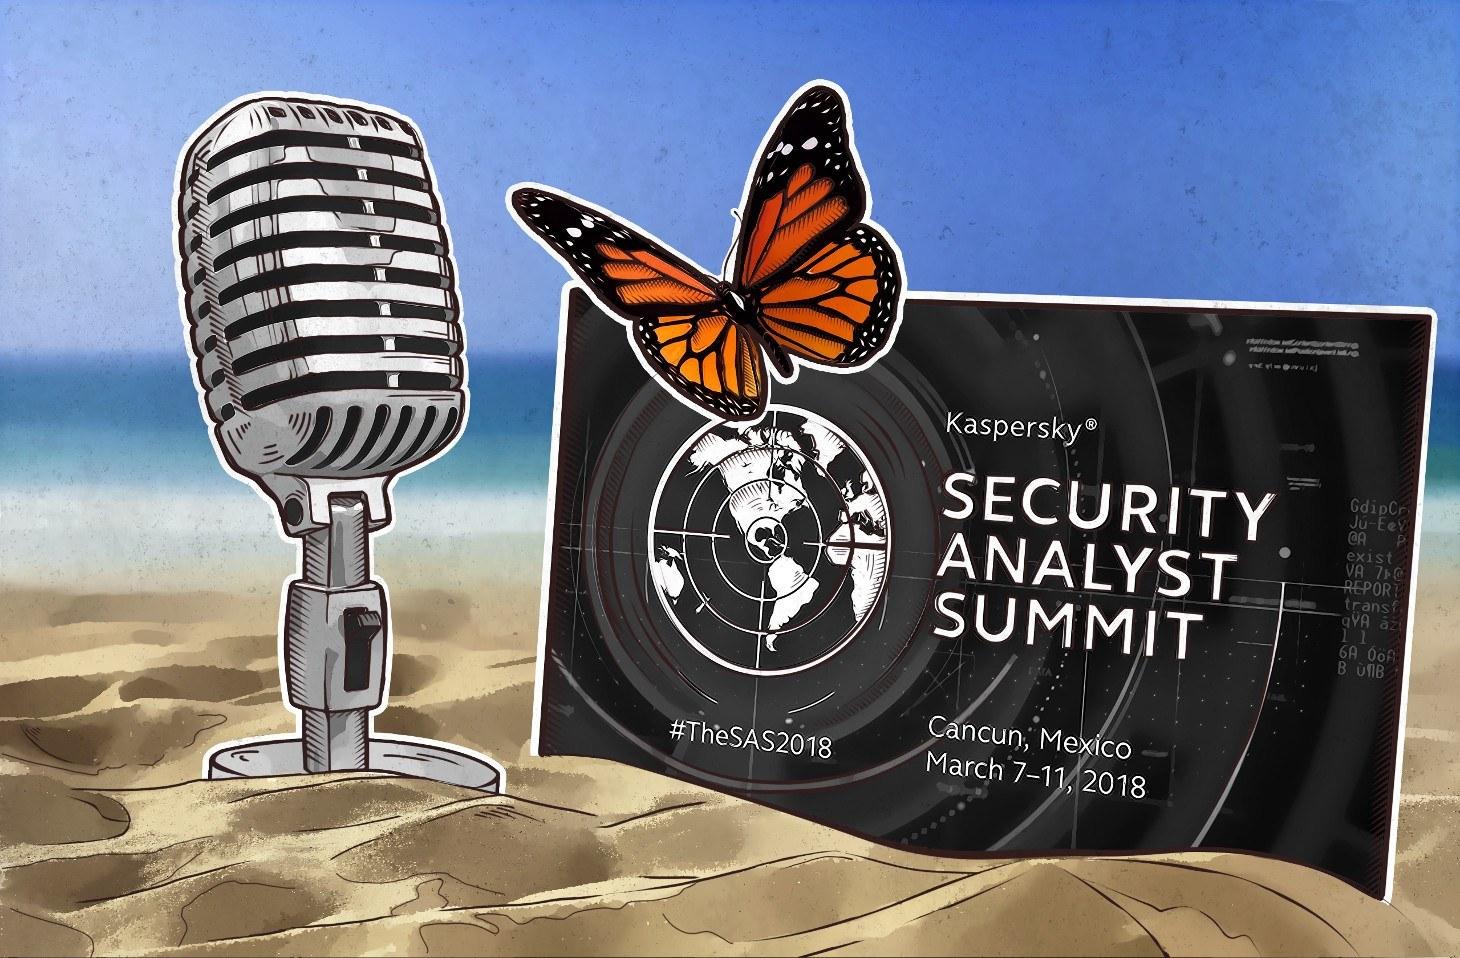 Security Analyst Summit 2018: Day 2 recap